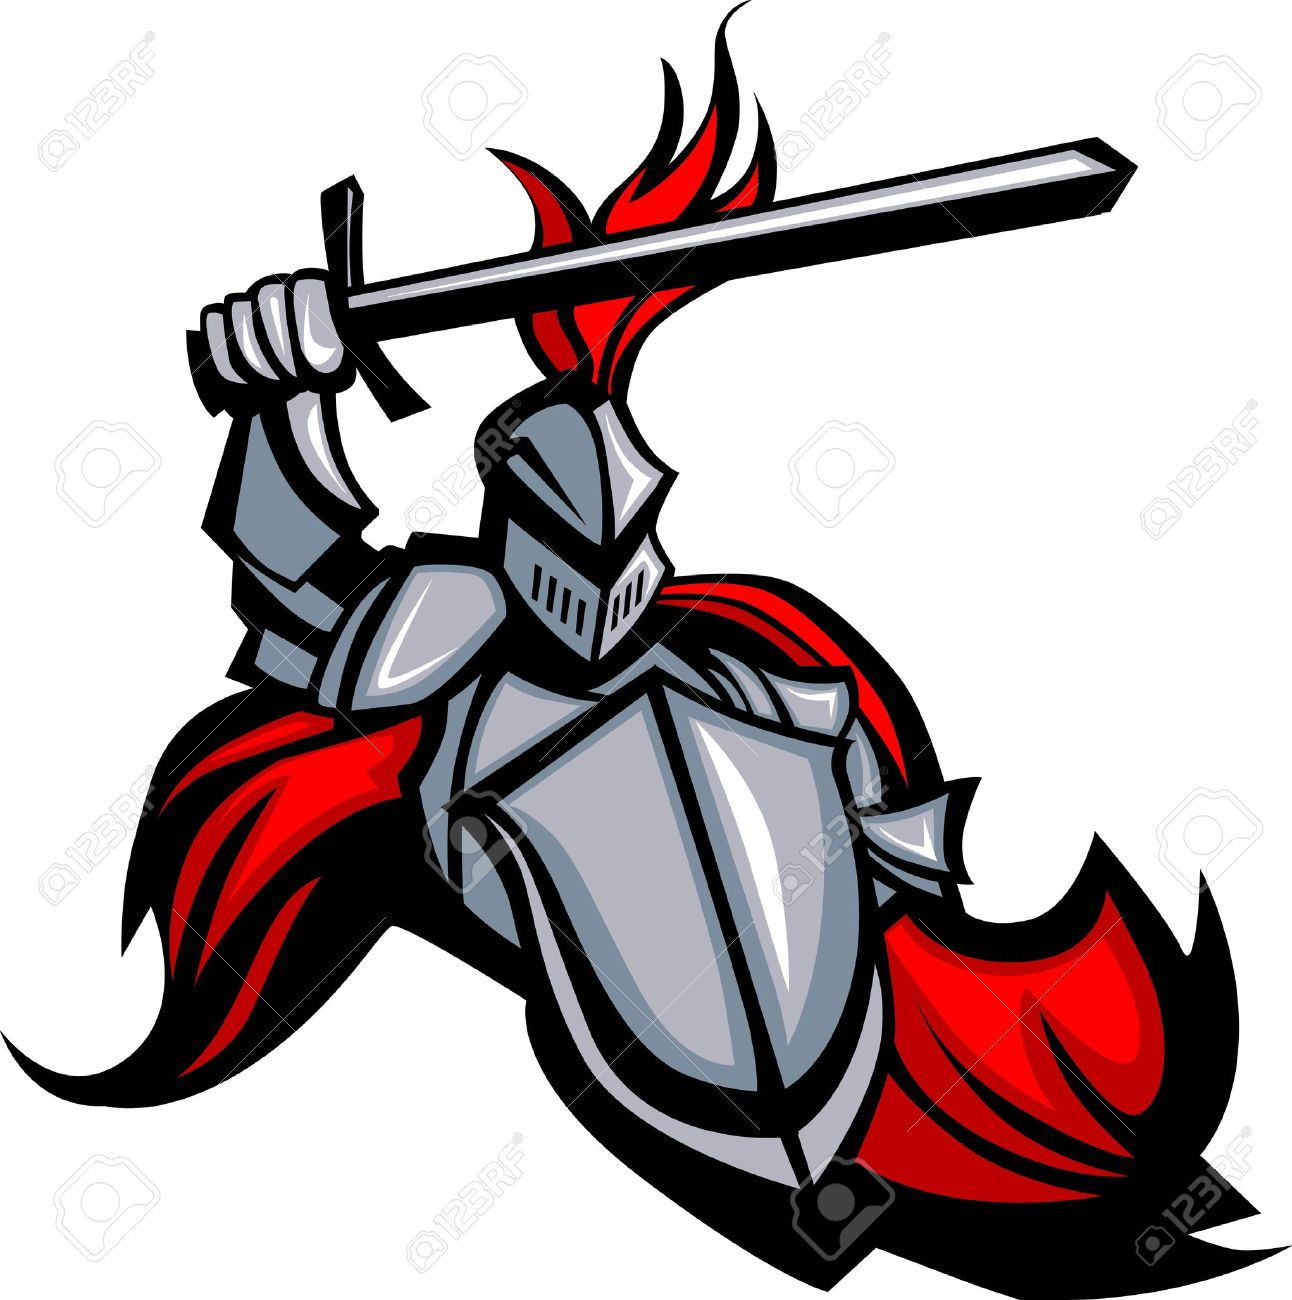 40 113 knight stock vector illustration and royalty free knight clipart rh 123rf com  knight in shining armor clipart free